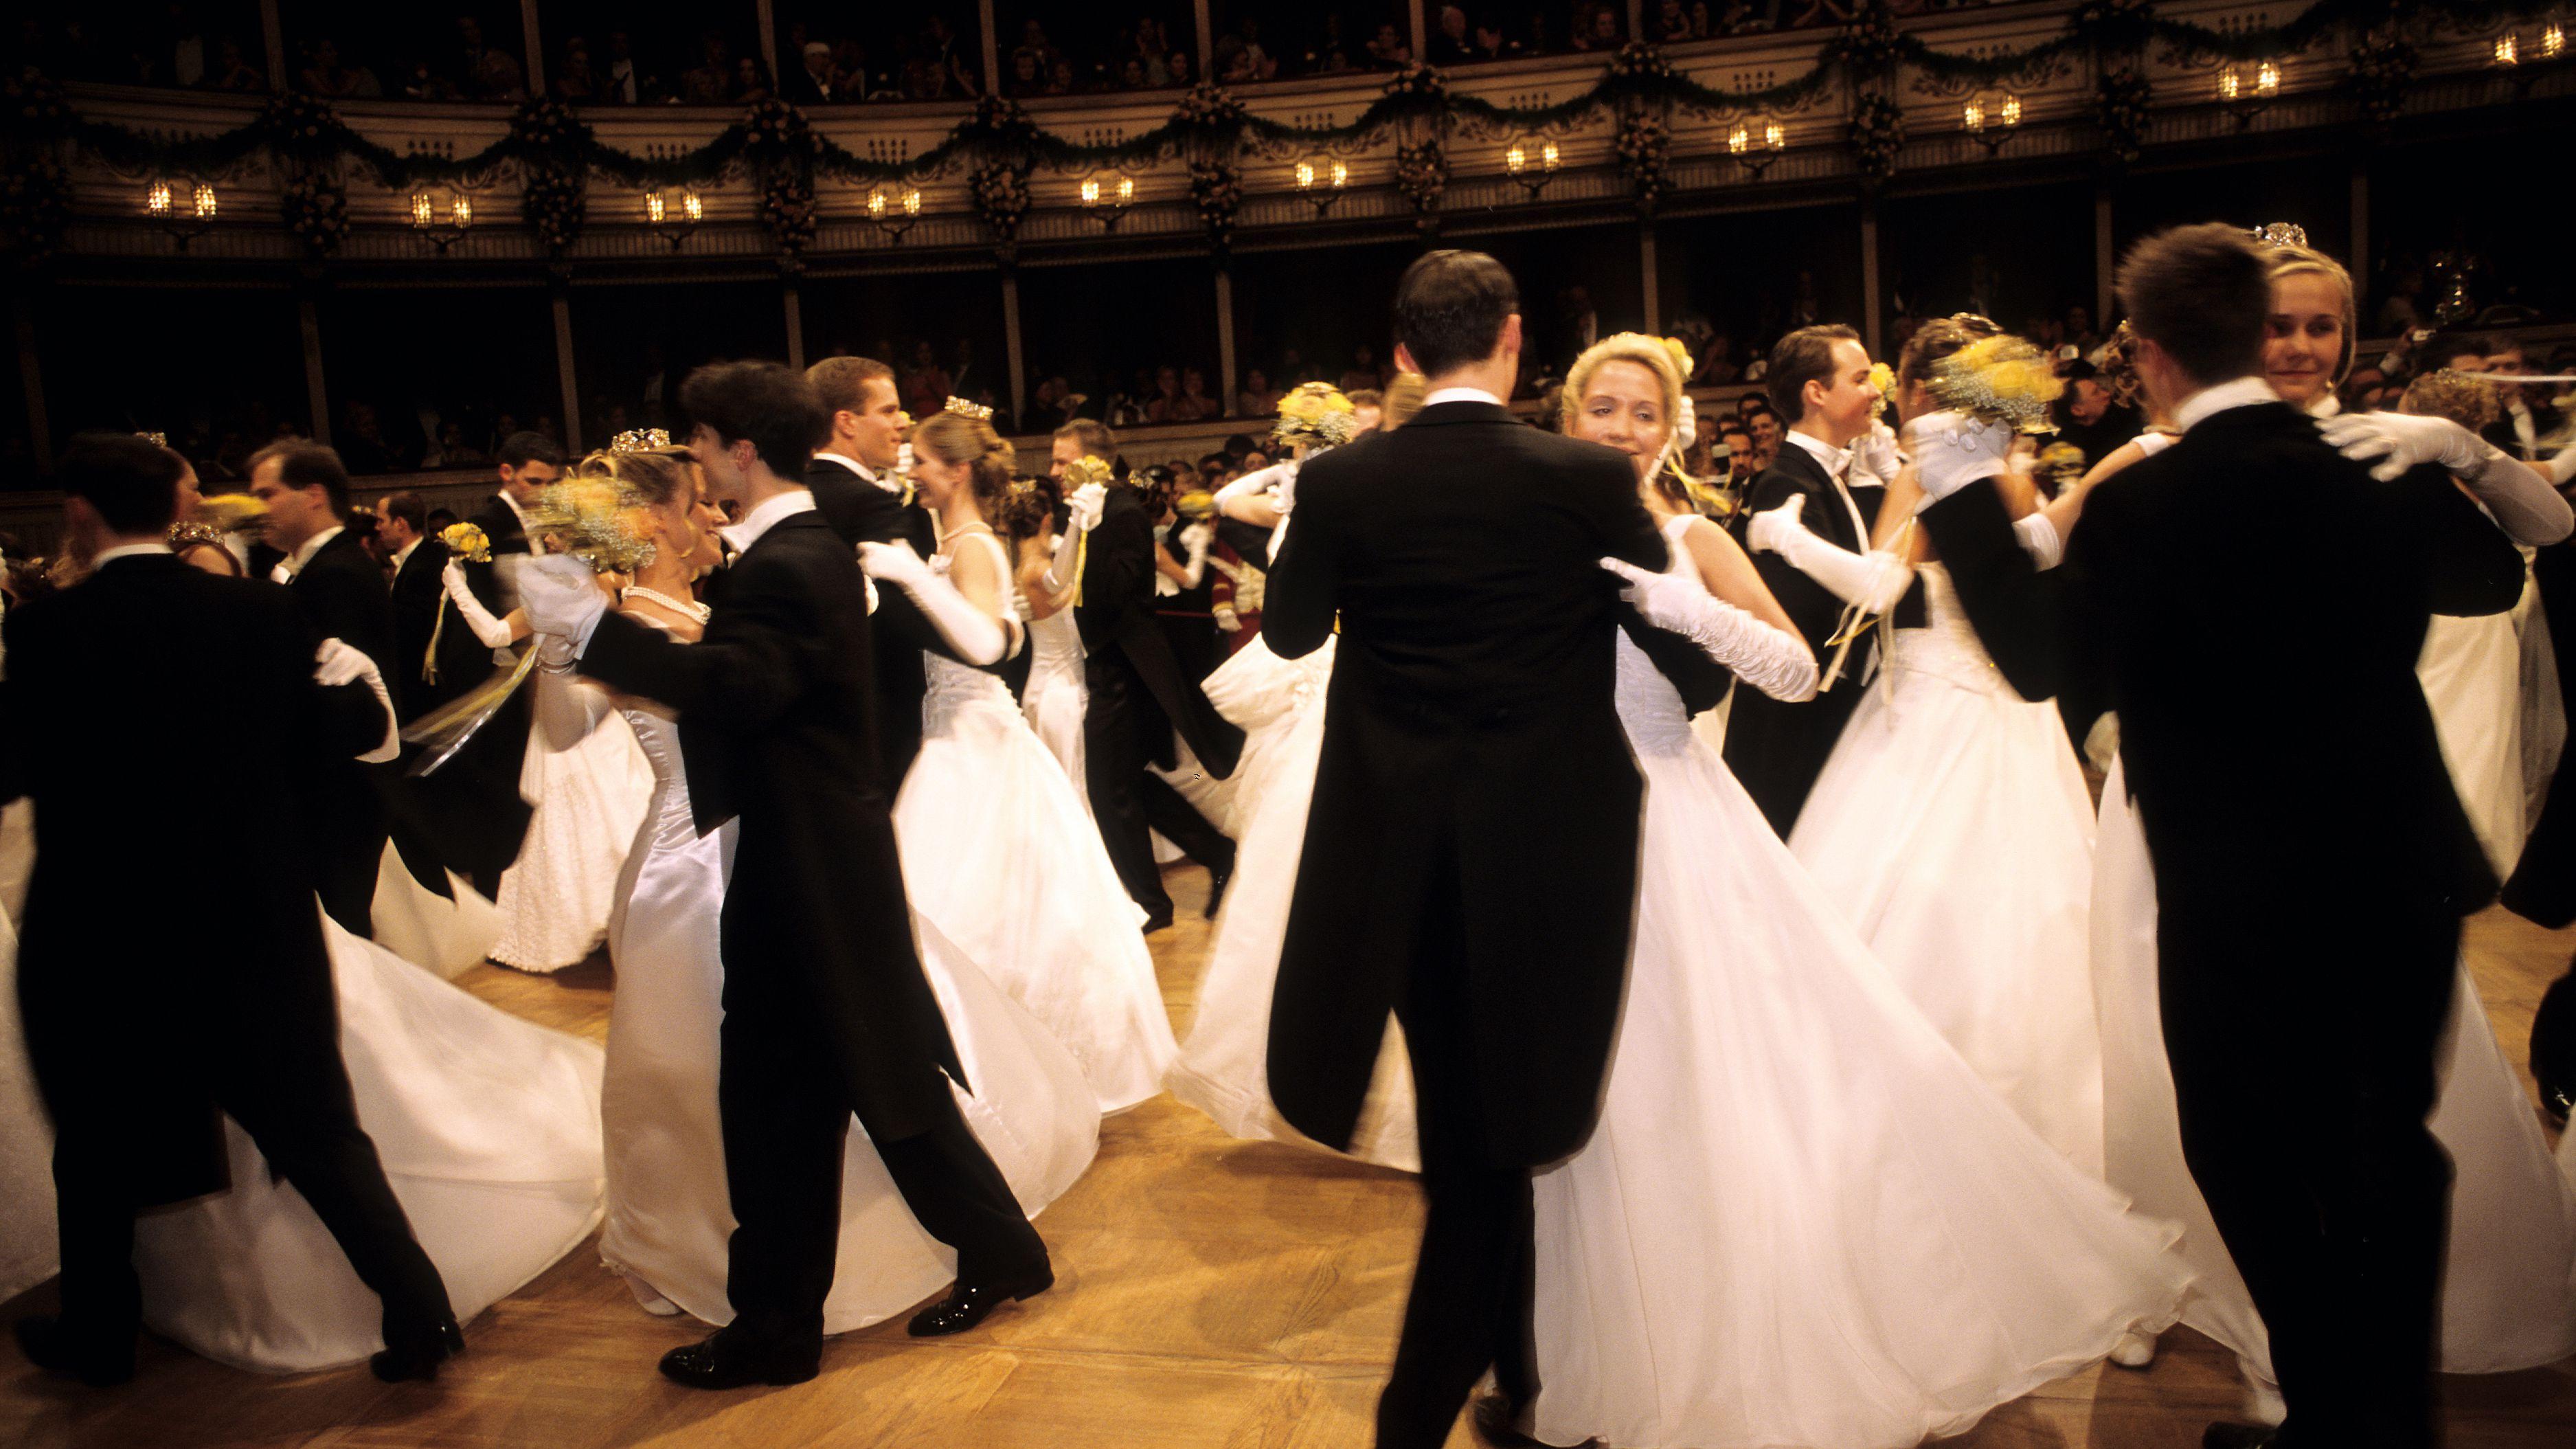 Proper Etiquette While Ballroom Dancing